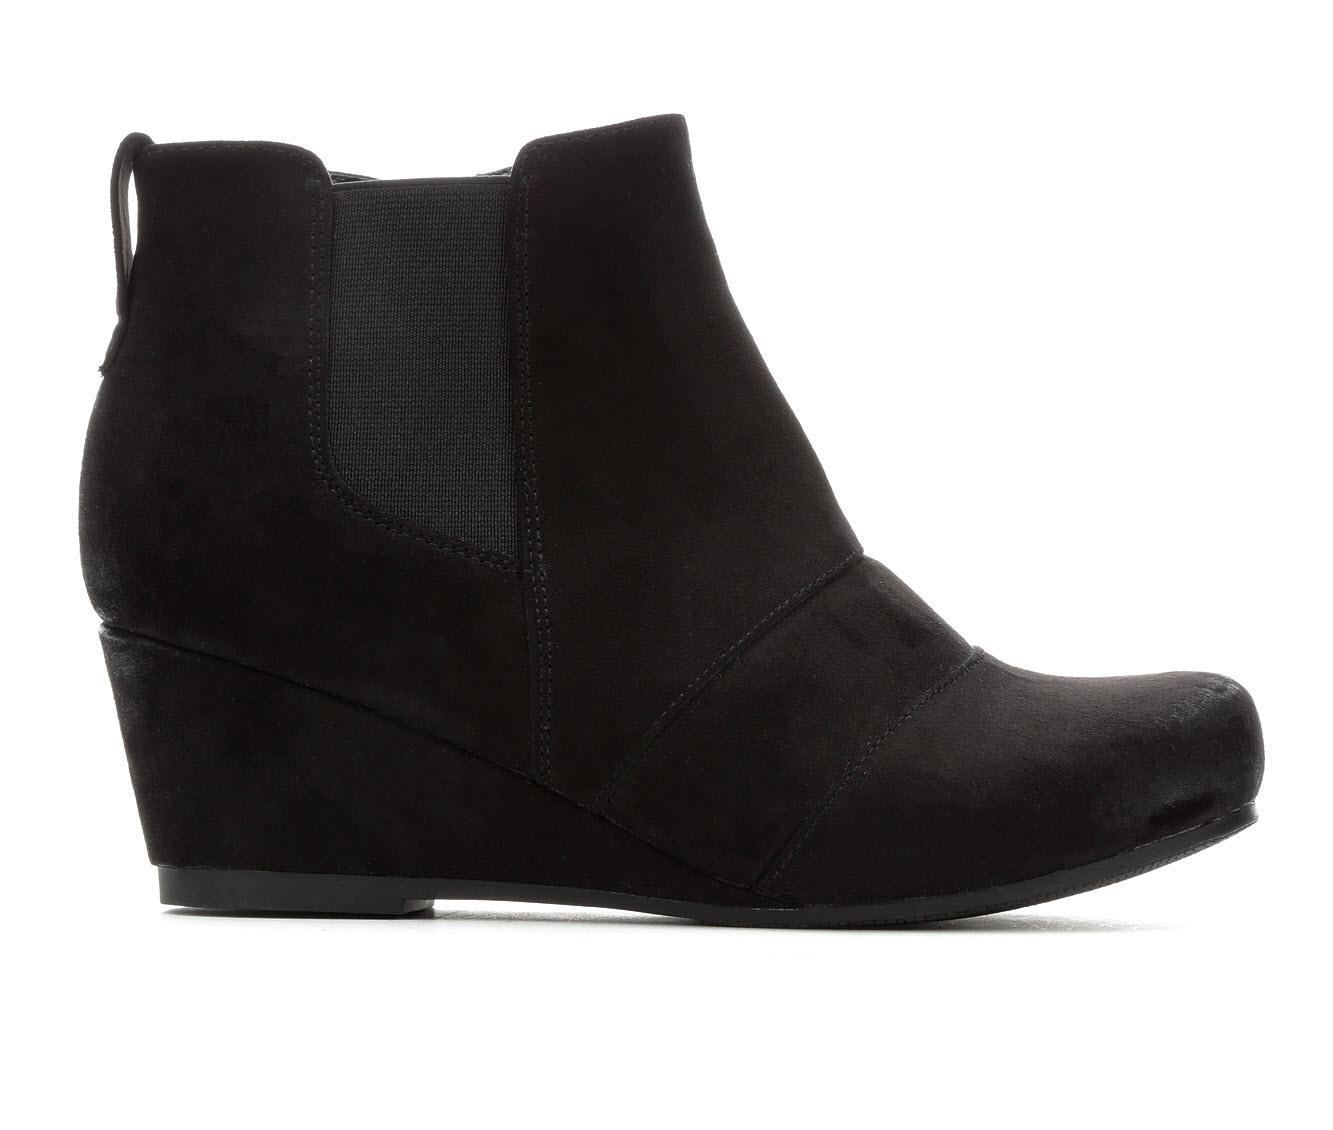 Axxiom Dreena Women's Boots (Black - Canvas)